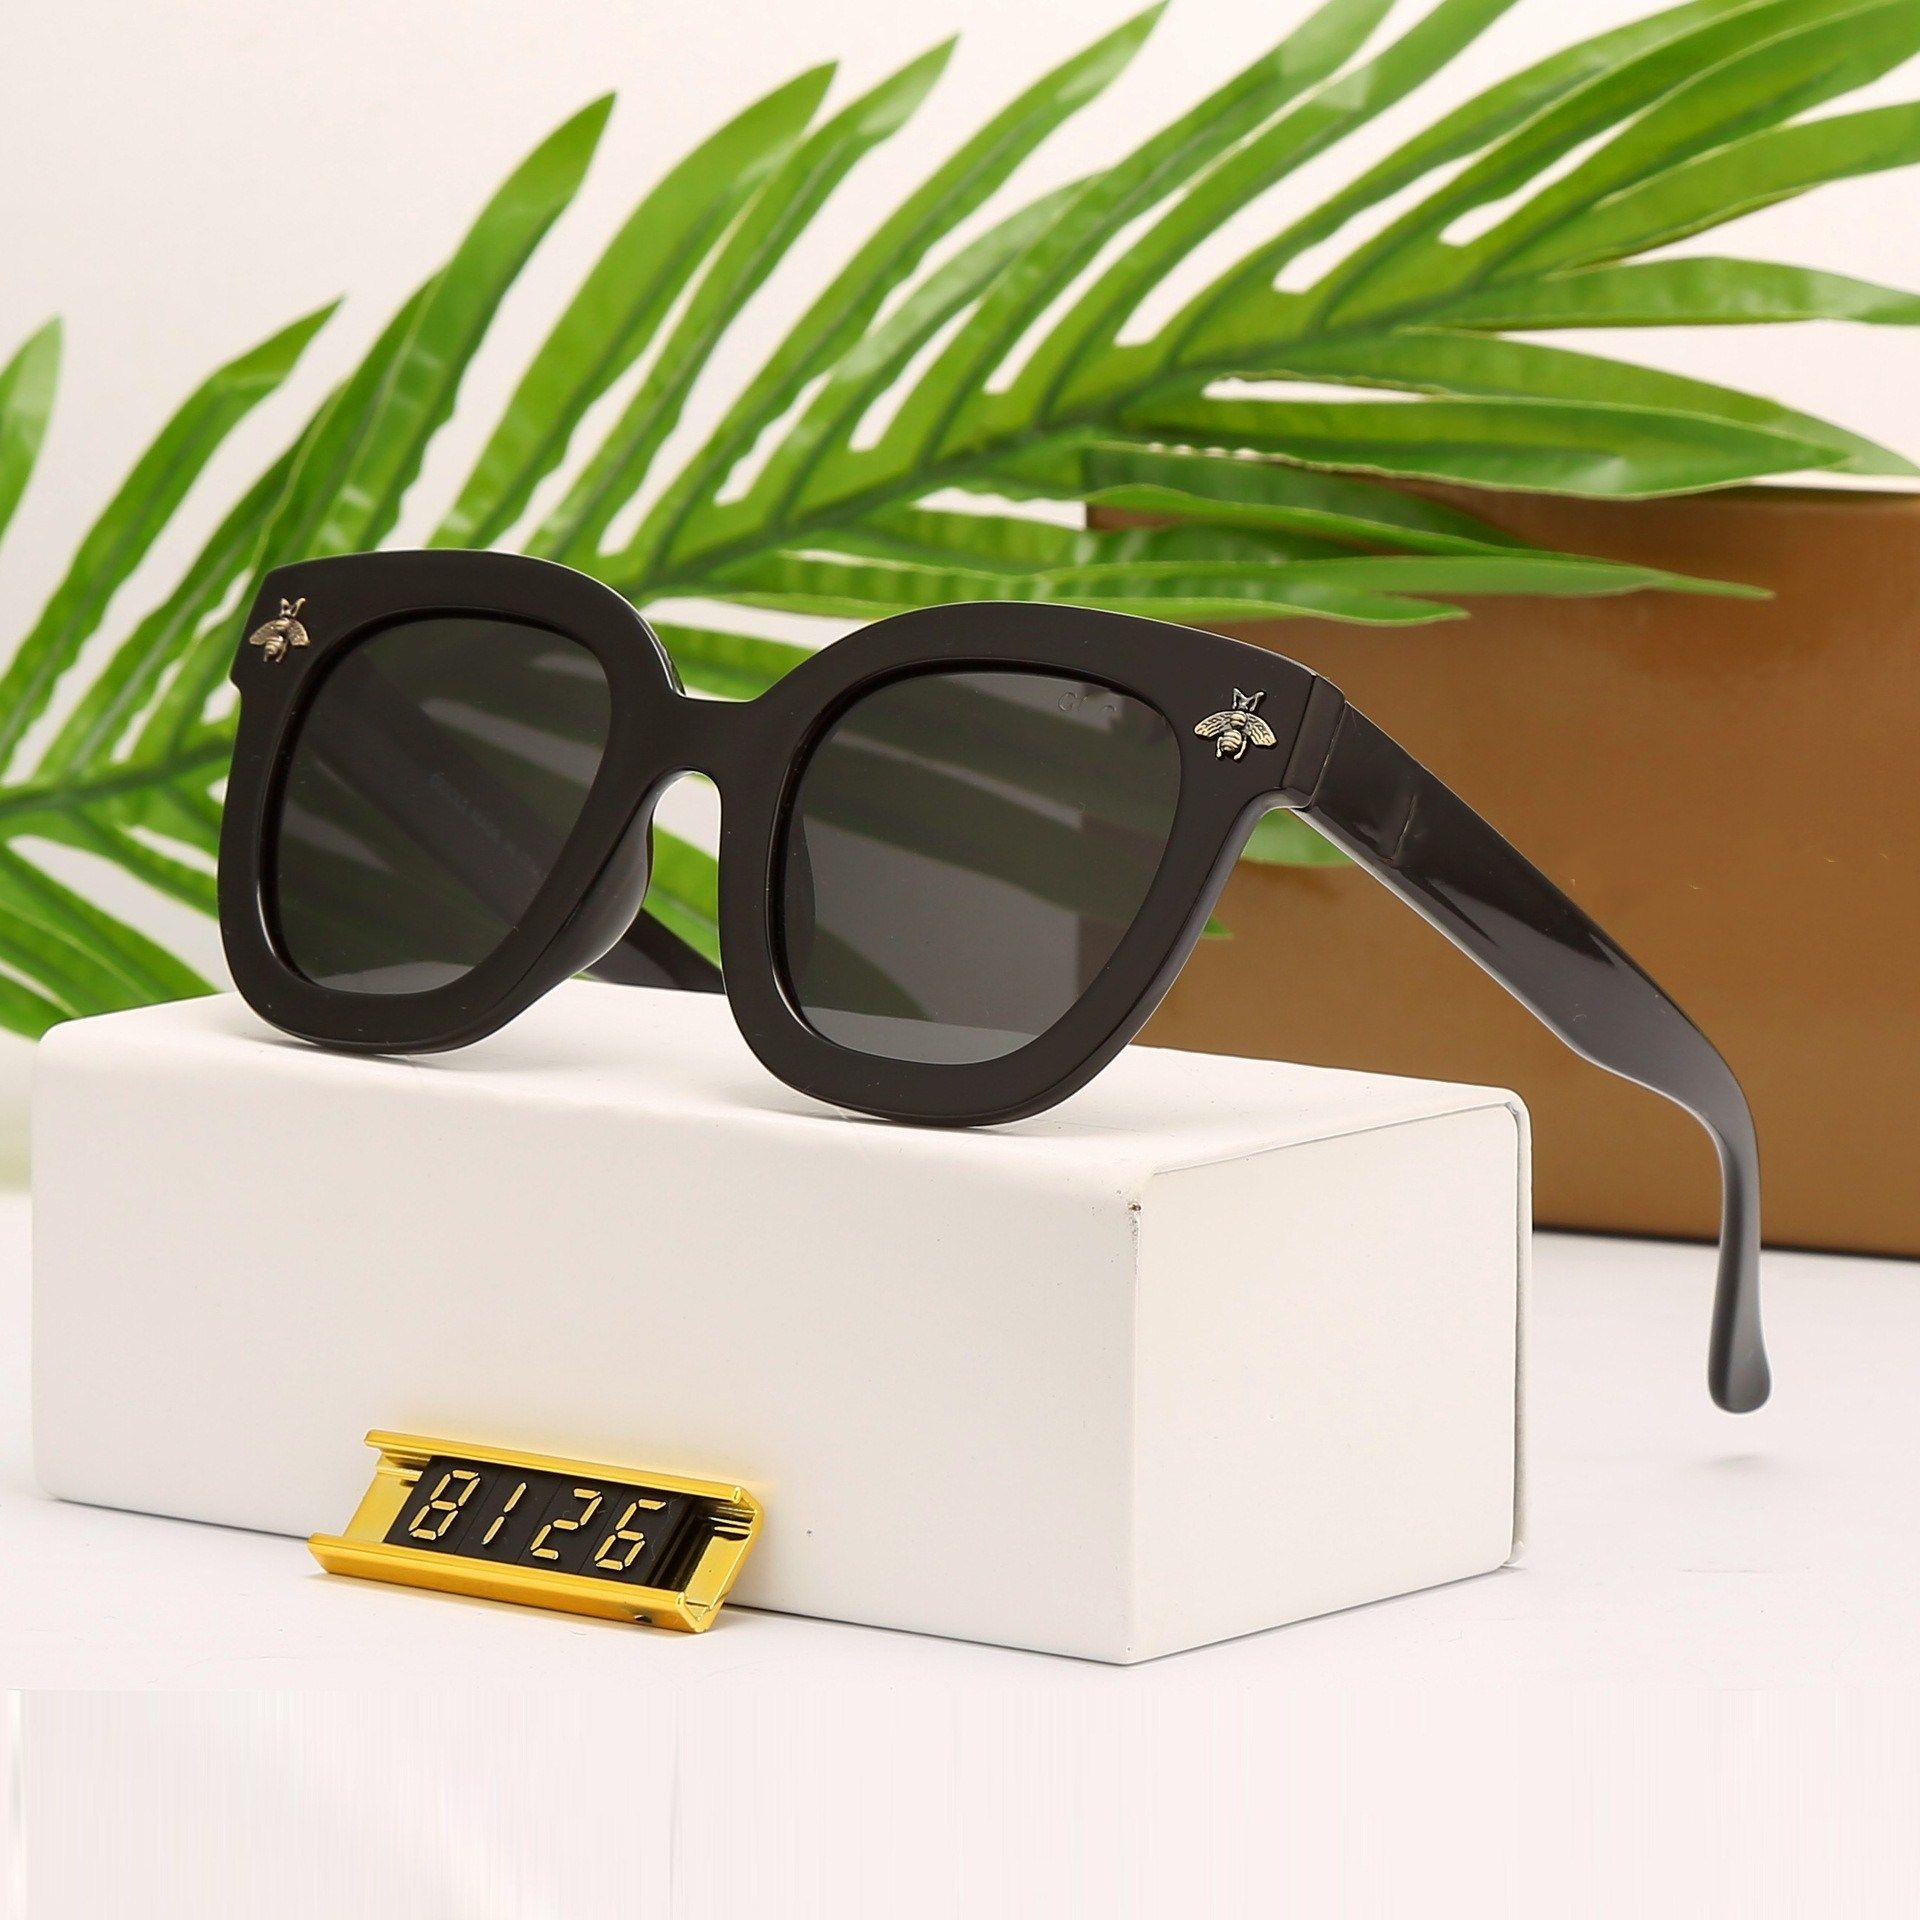 087b8d7163 8125 Luxury Fashion Sunglass Women Brand Deisnger UV Protection Lens ...